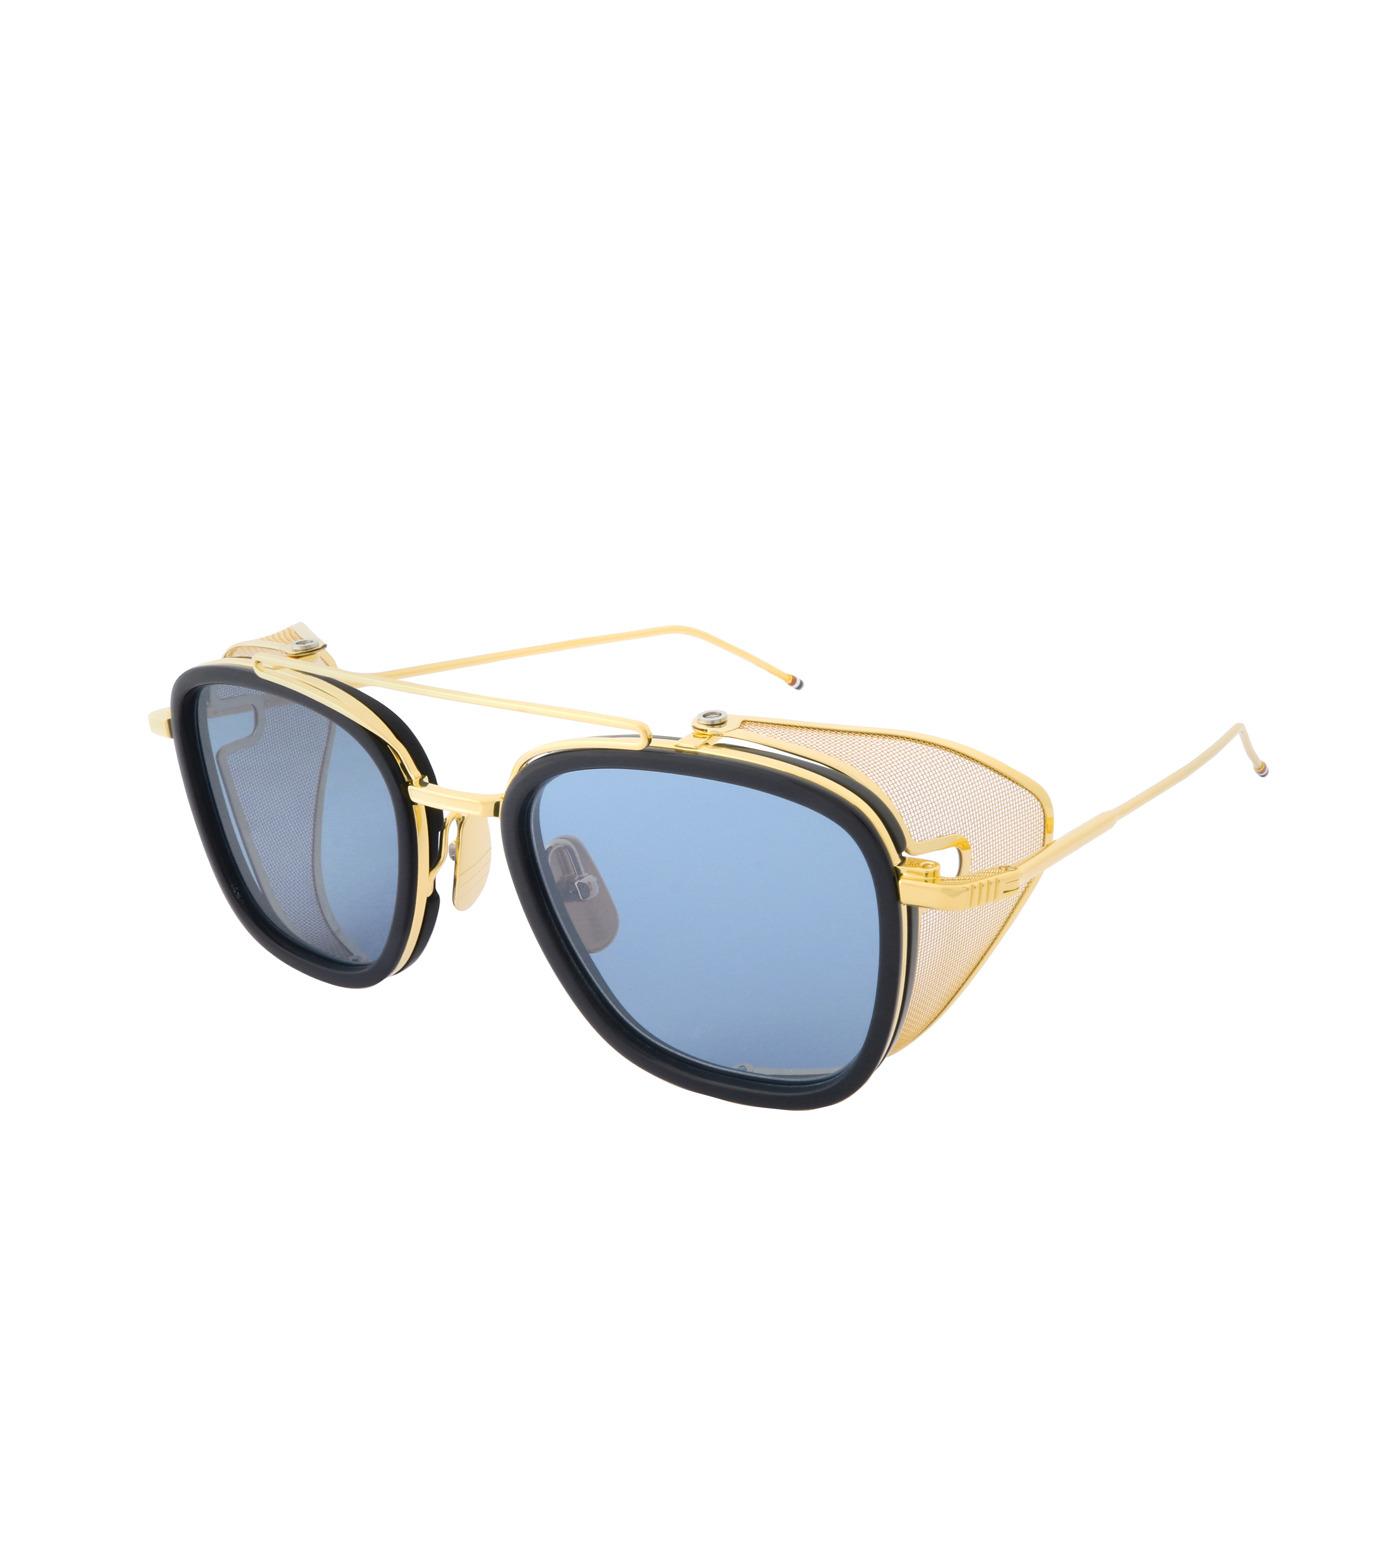 Thom Browne Eye Wear(トム・ブラウン・アイウェア)のSidemesh Sunglass-NAVY(アイウェア/eyewear)-TB-808-C-93 拡大詳細画像1